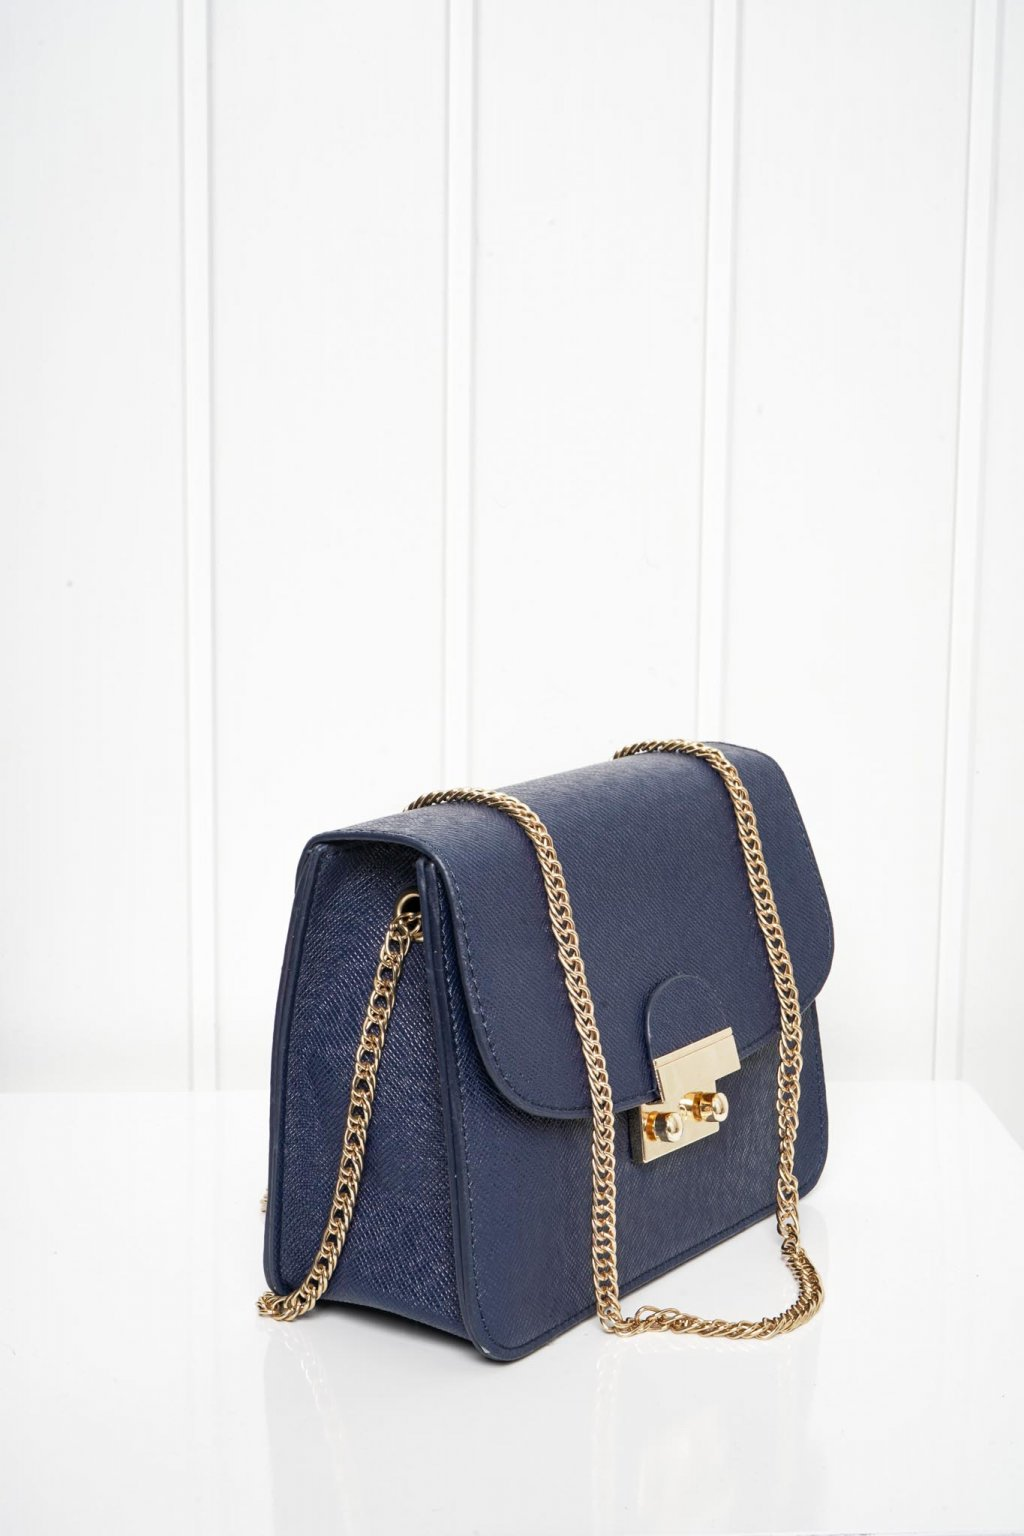 Kabelka, crossbody, ruksak, shopping bag, shopperka, 491